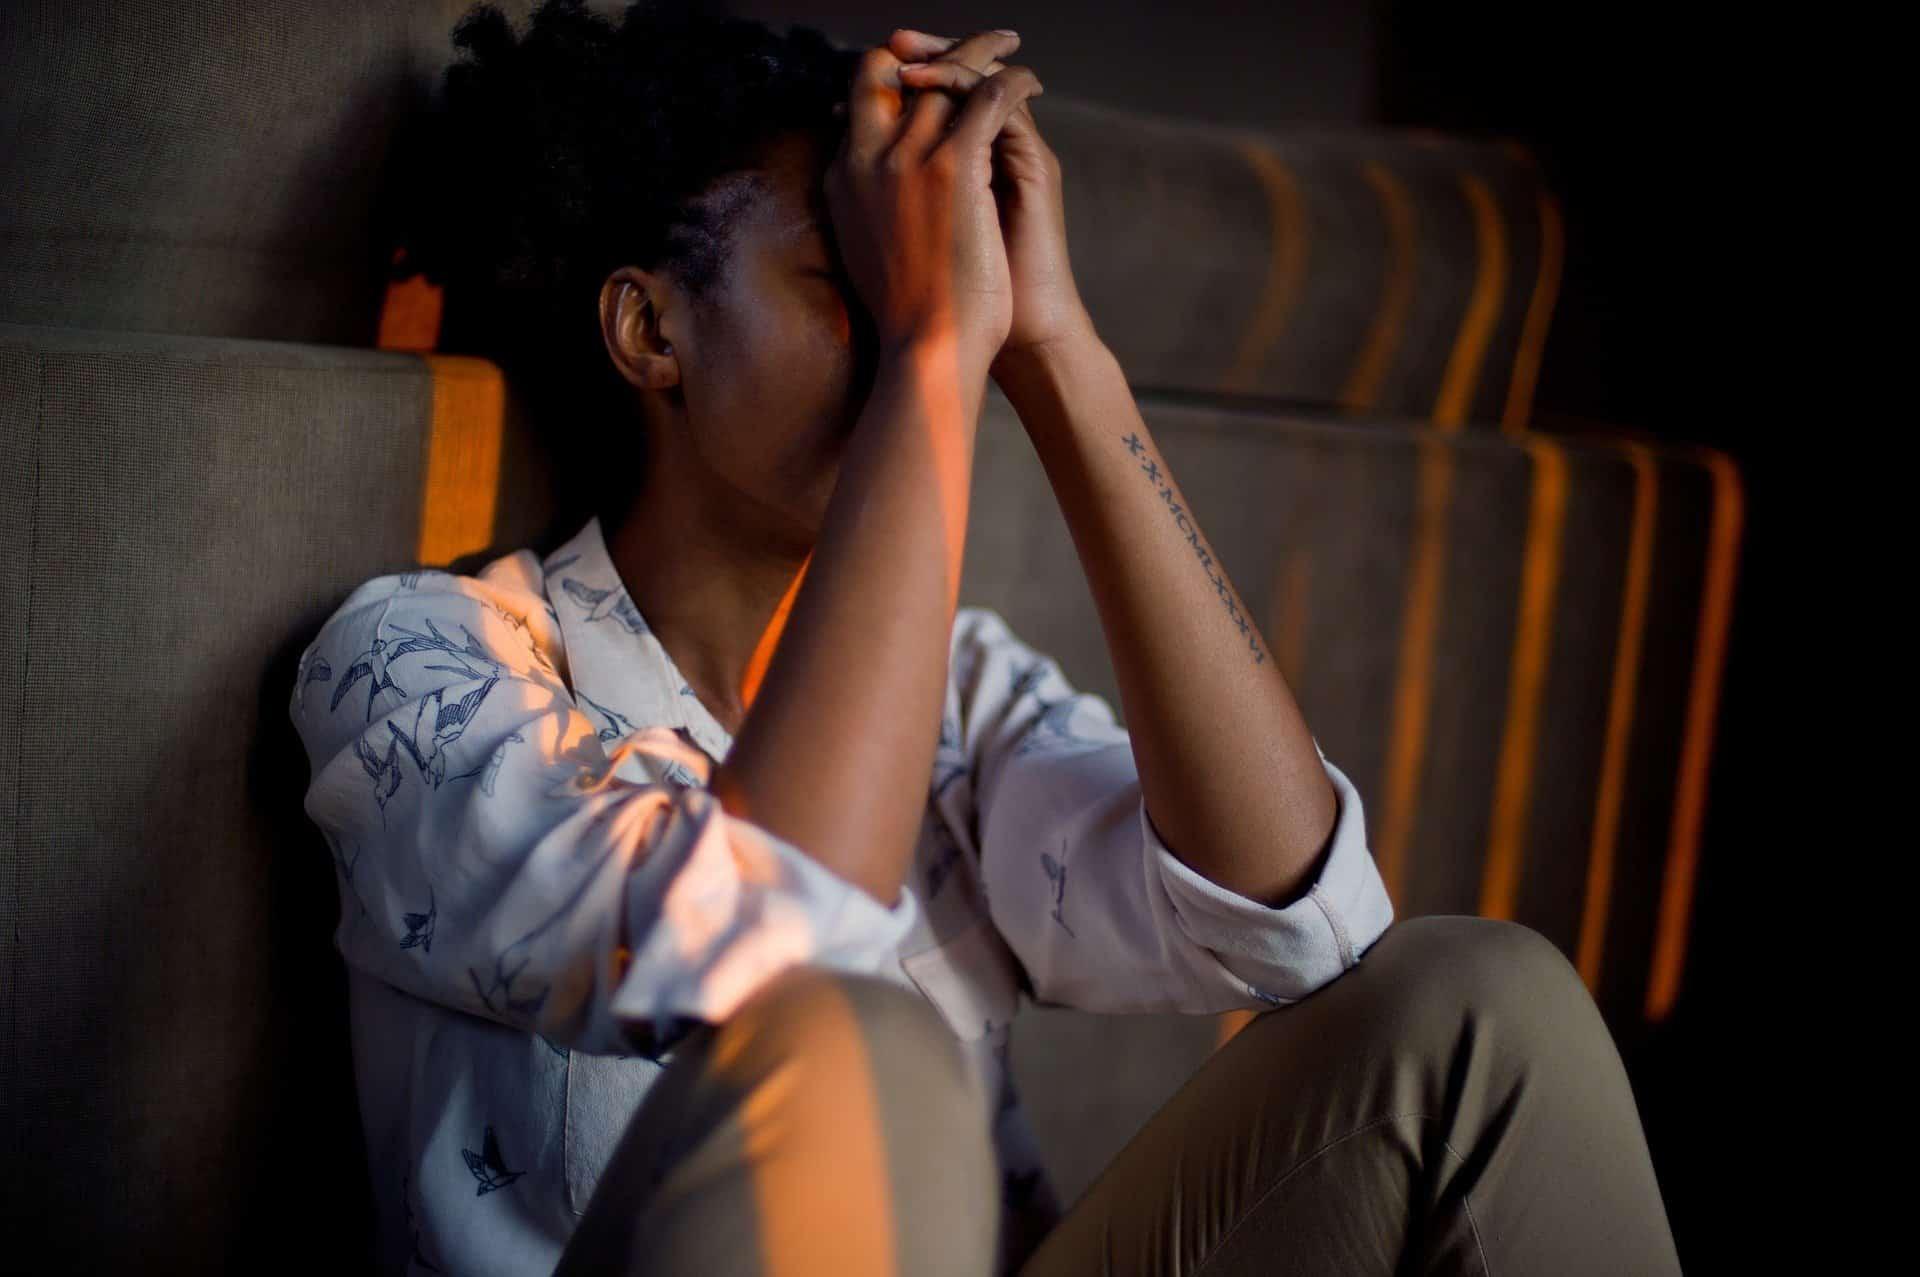 Treatment of Opiate Addiction